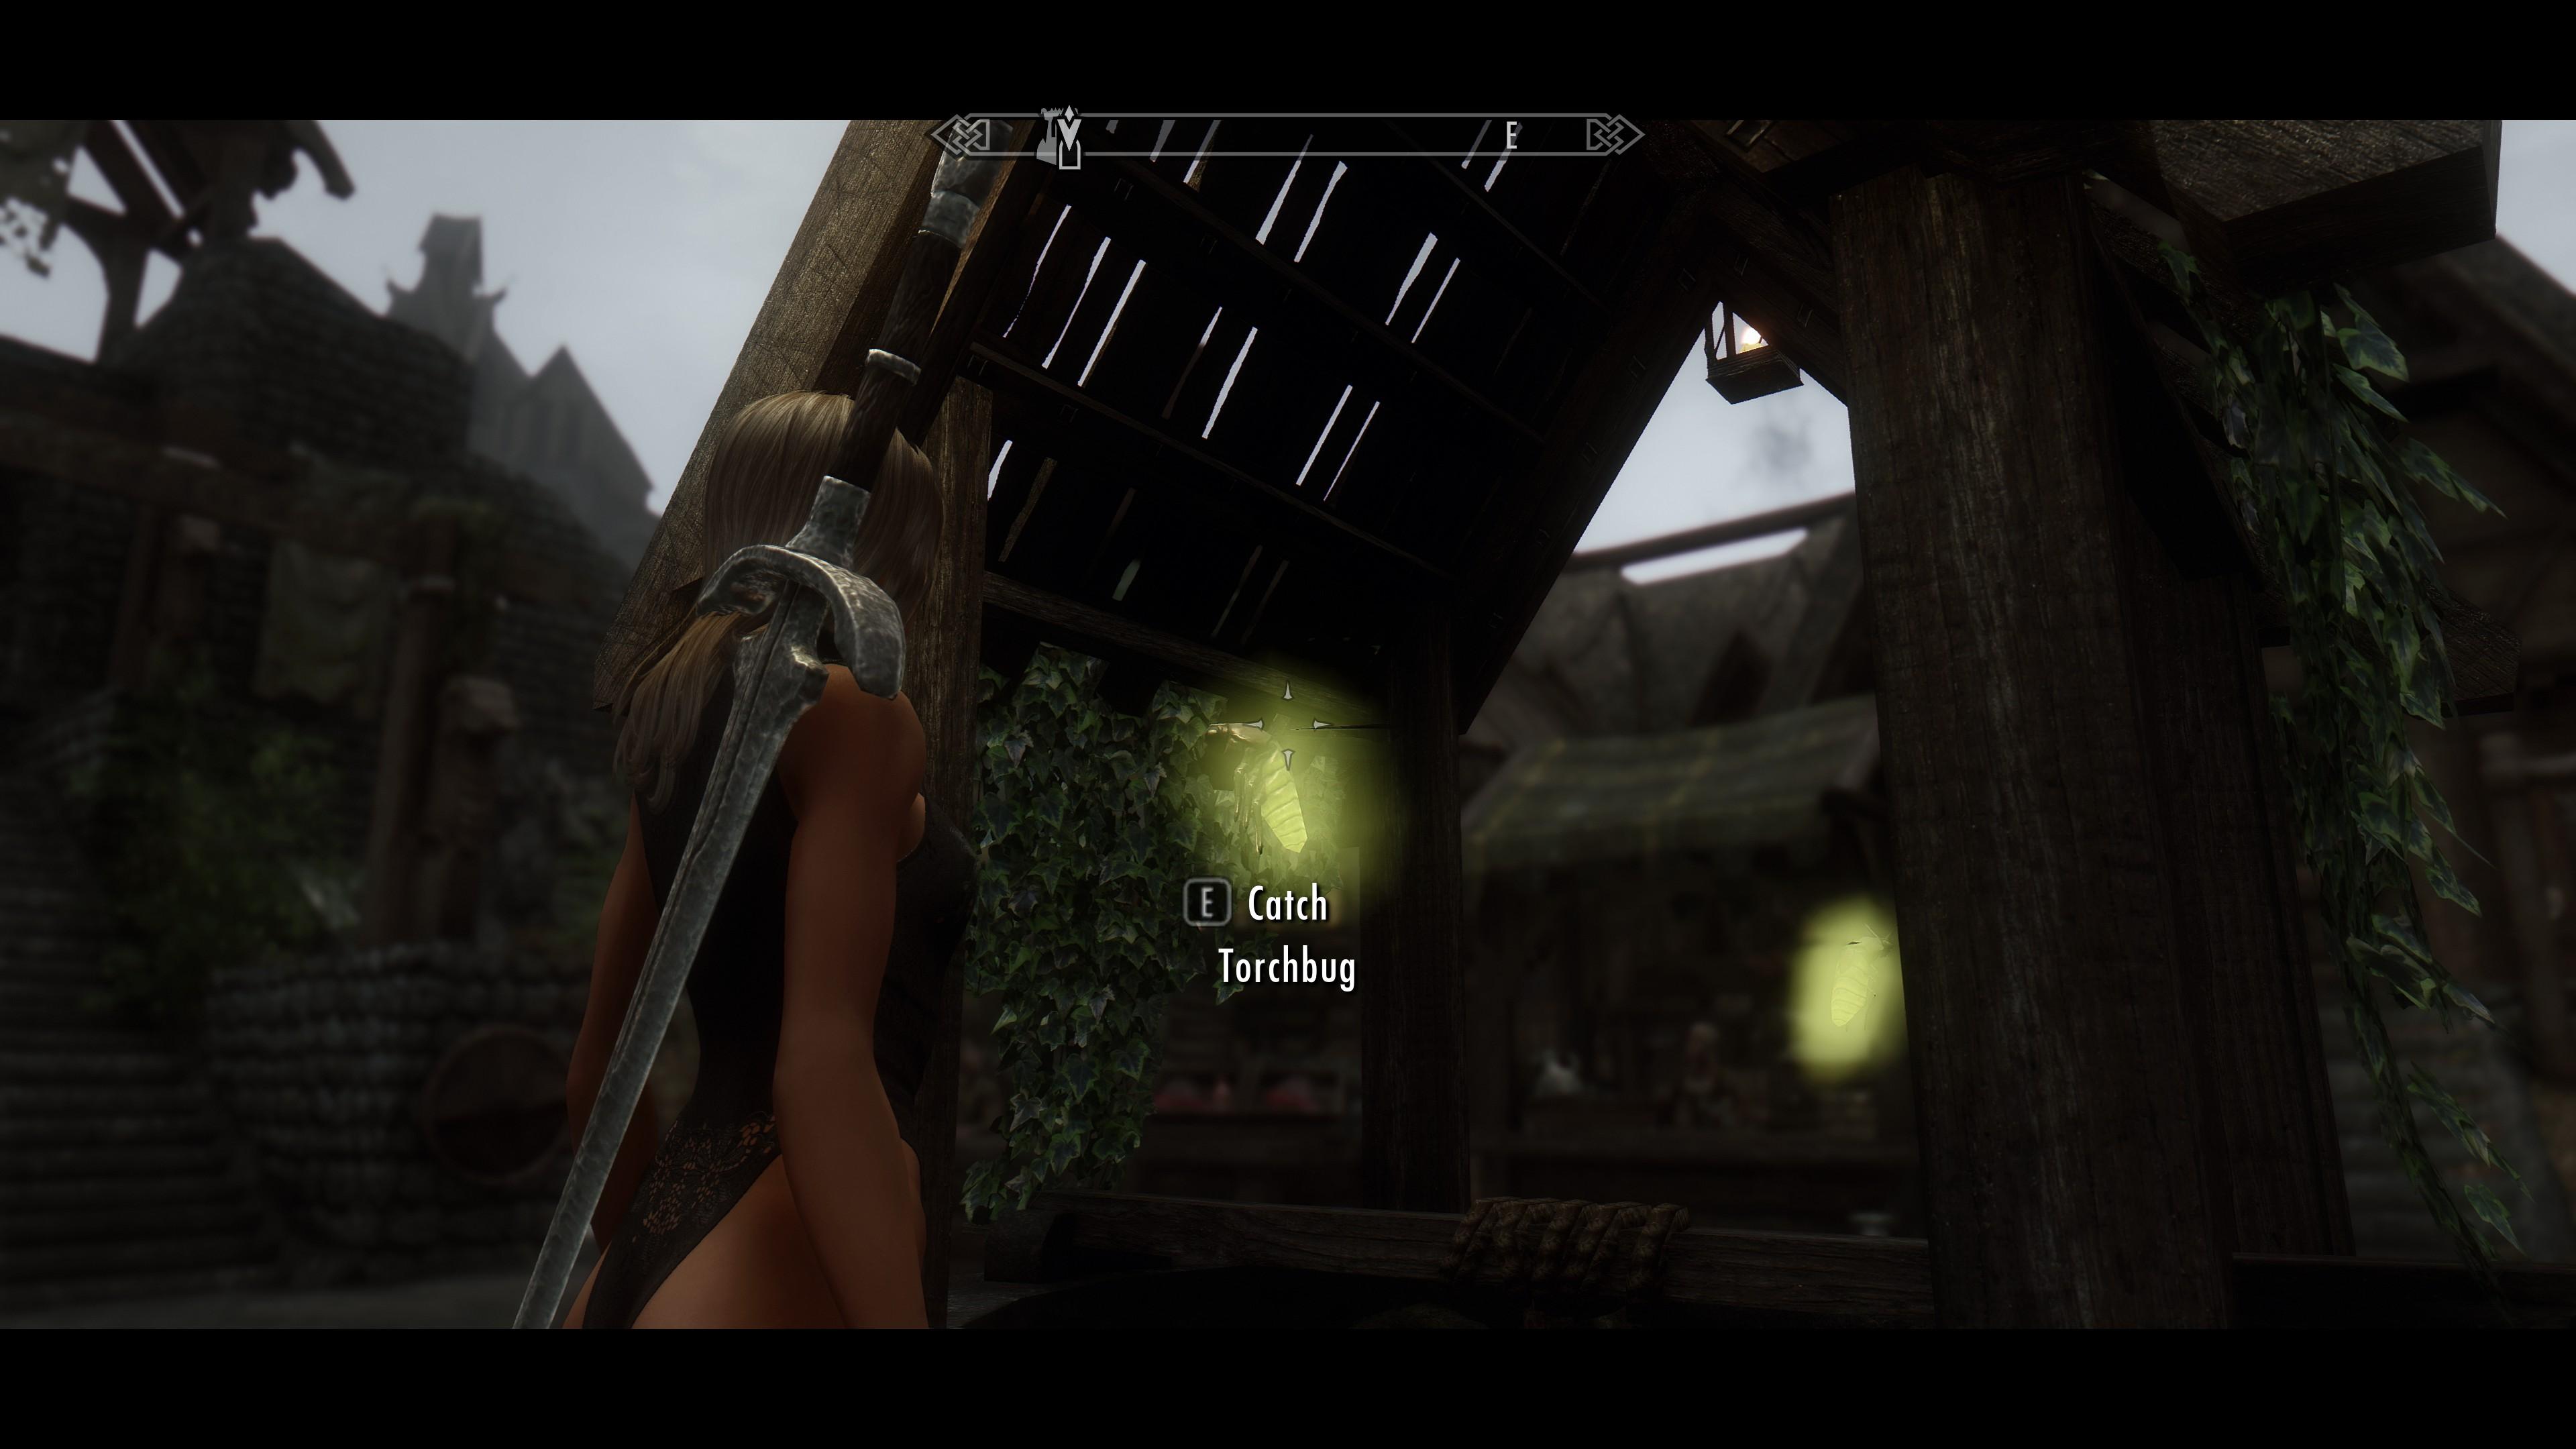 20191204201119_1.jpg - The Elder Scrolls 5: Skyrim